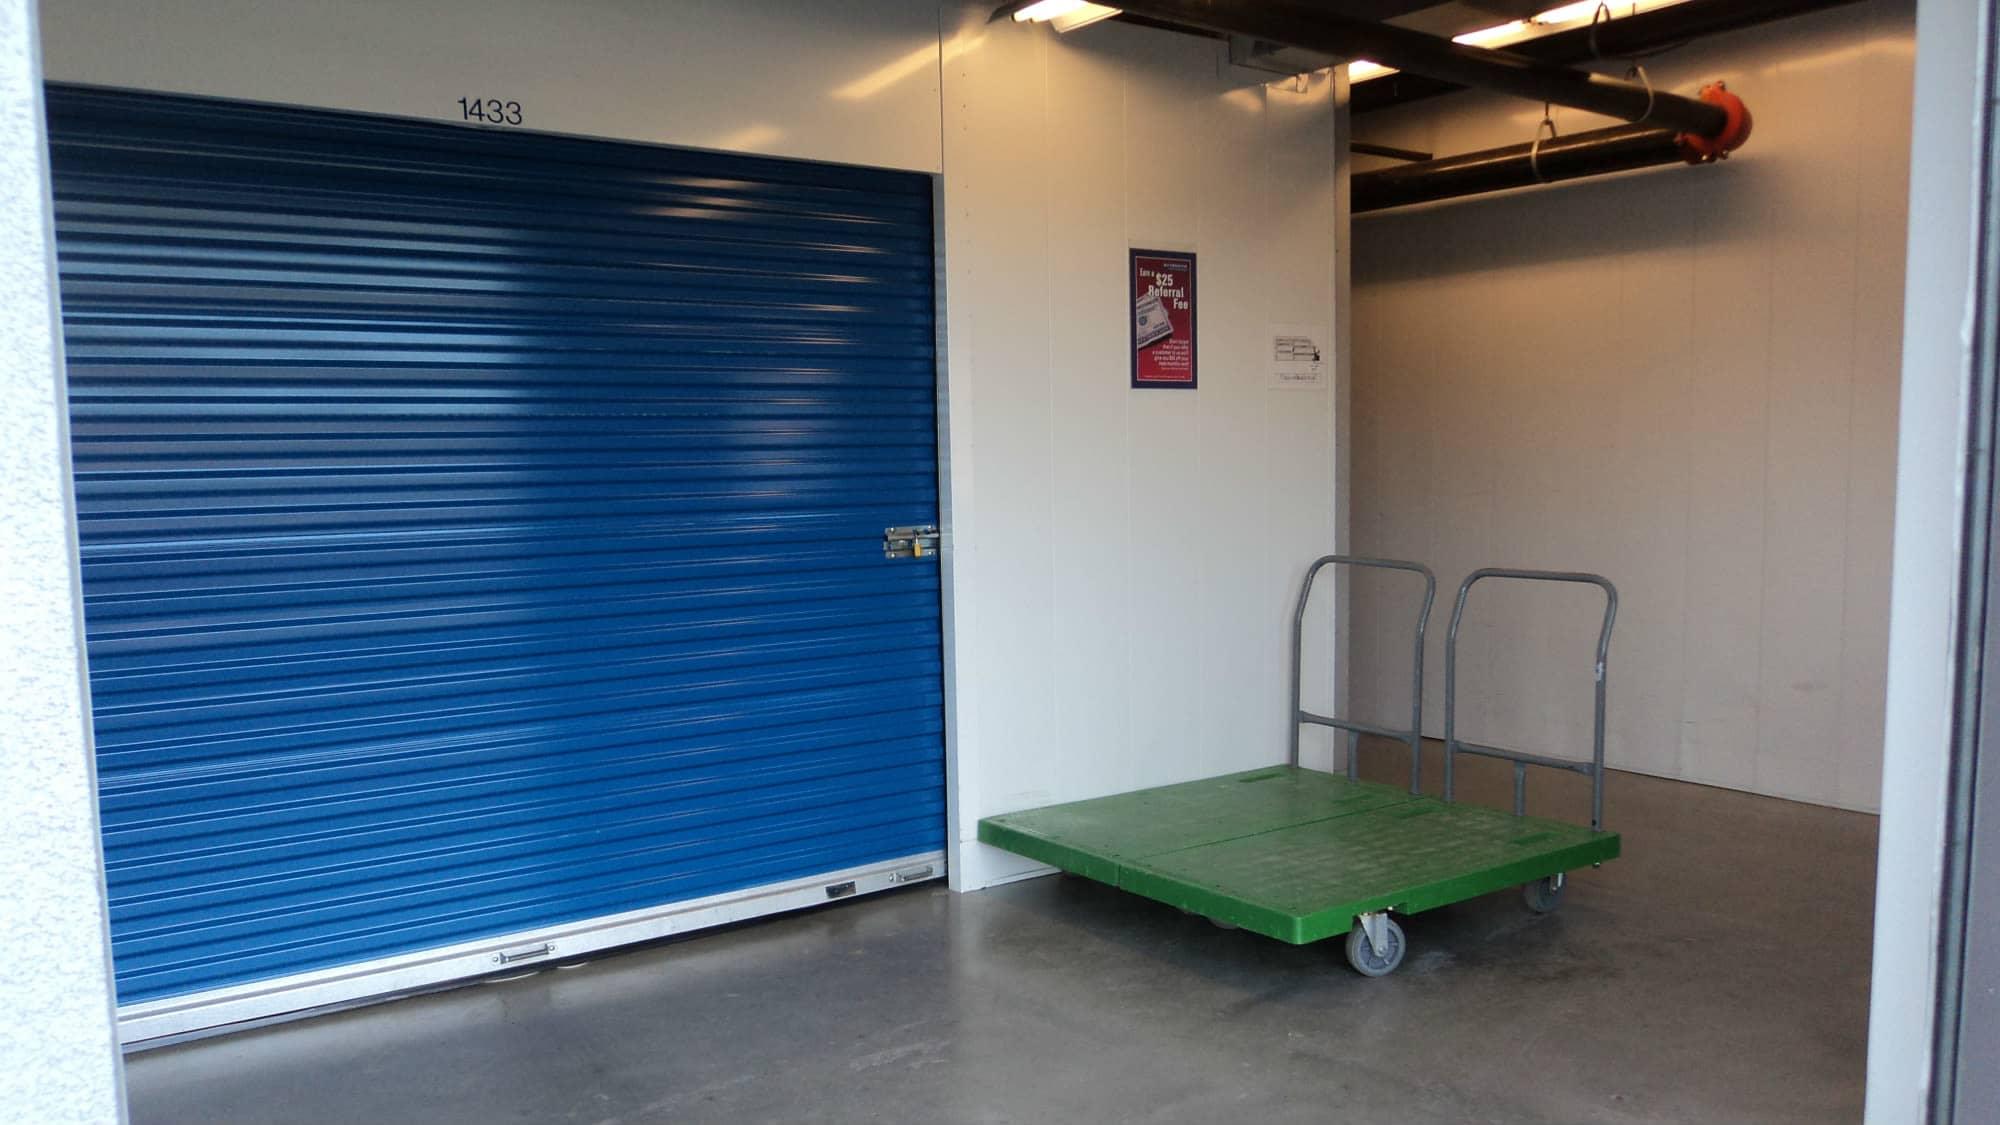 Carts available at Self Storage Plus in Woodbridge, VA